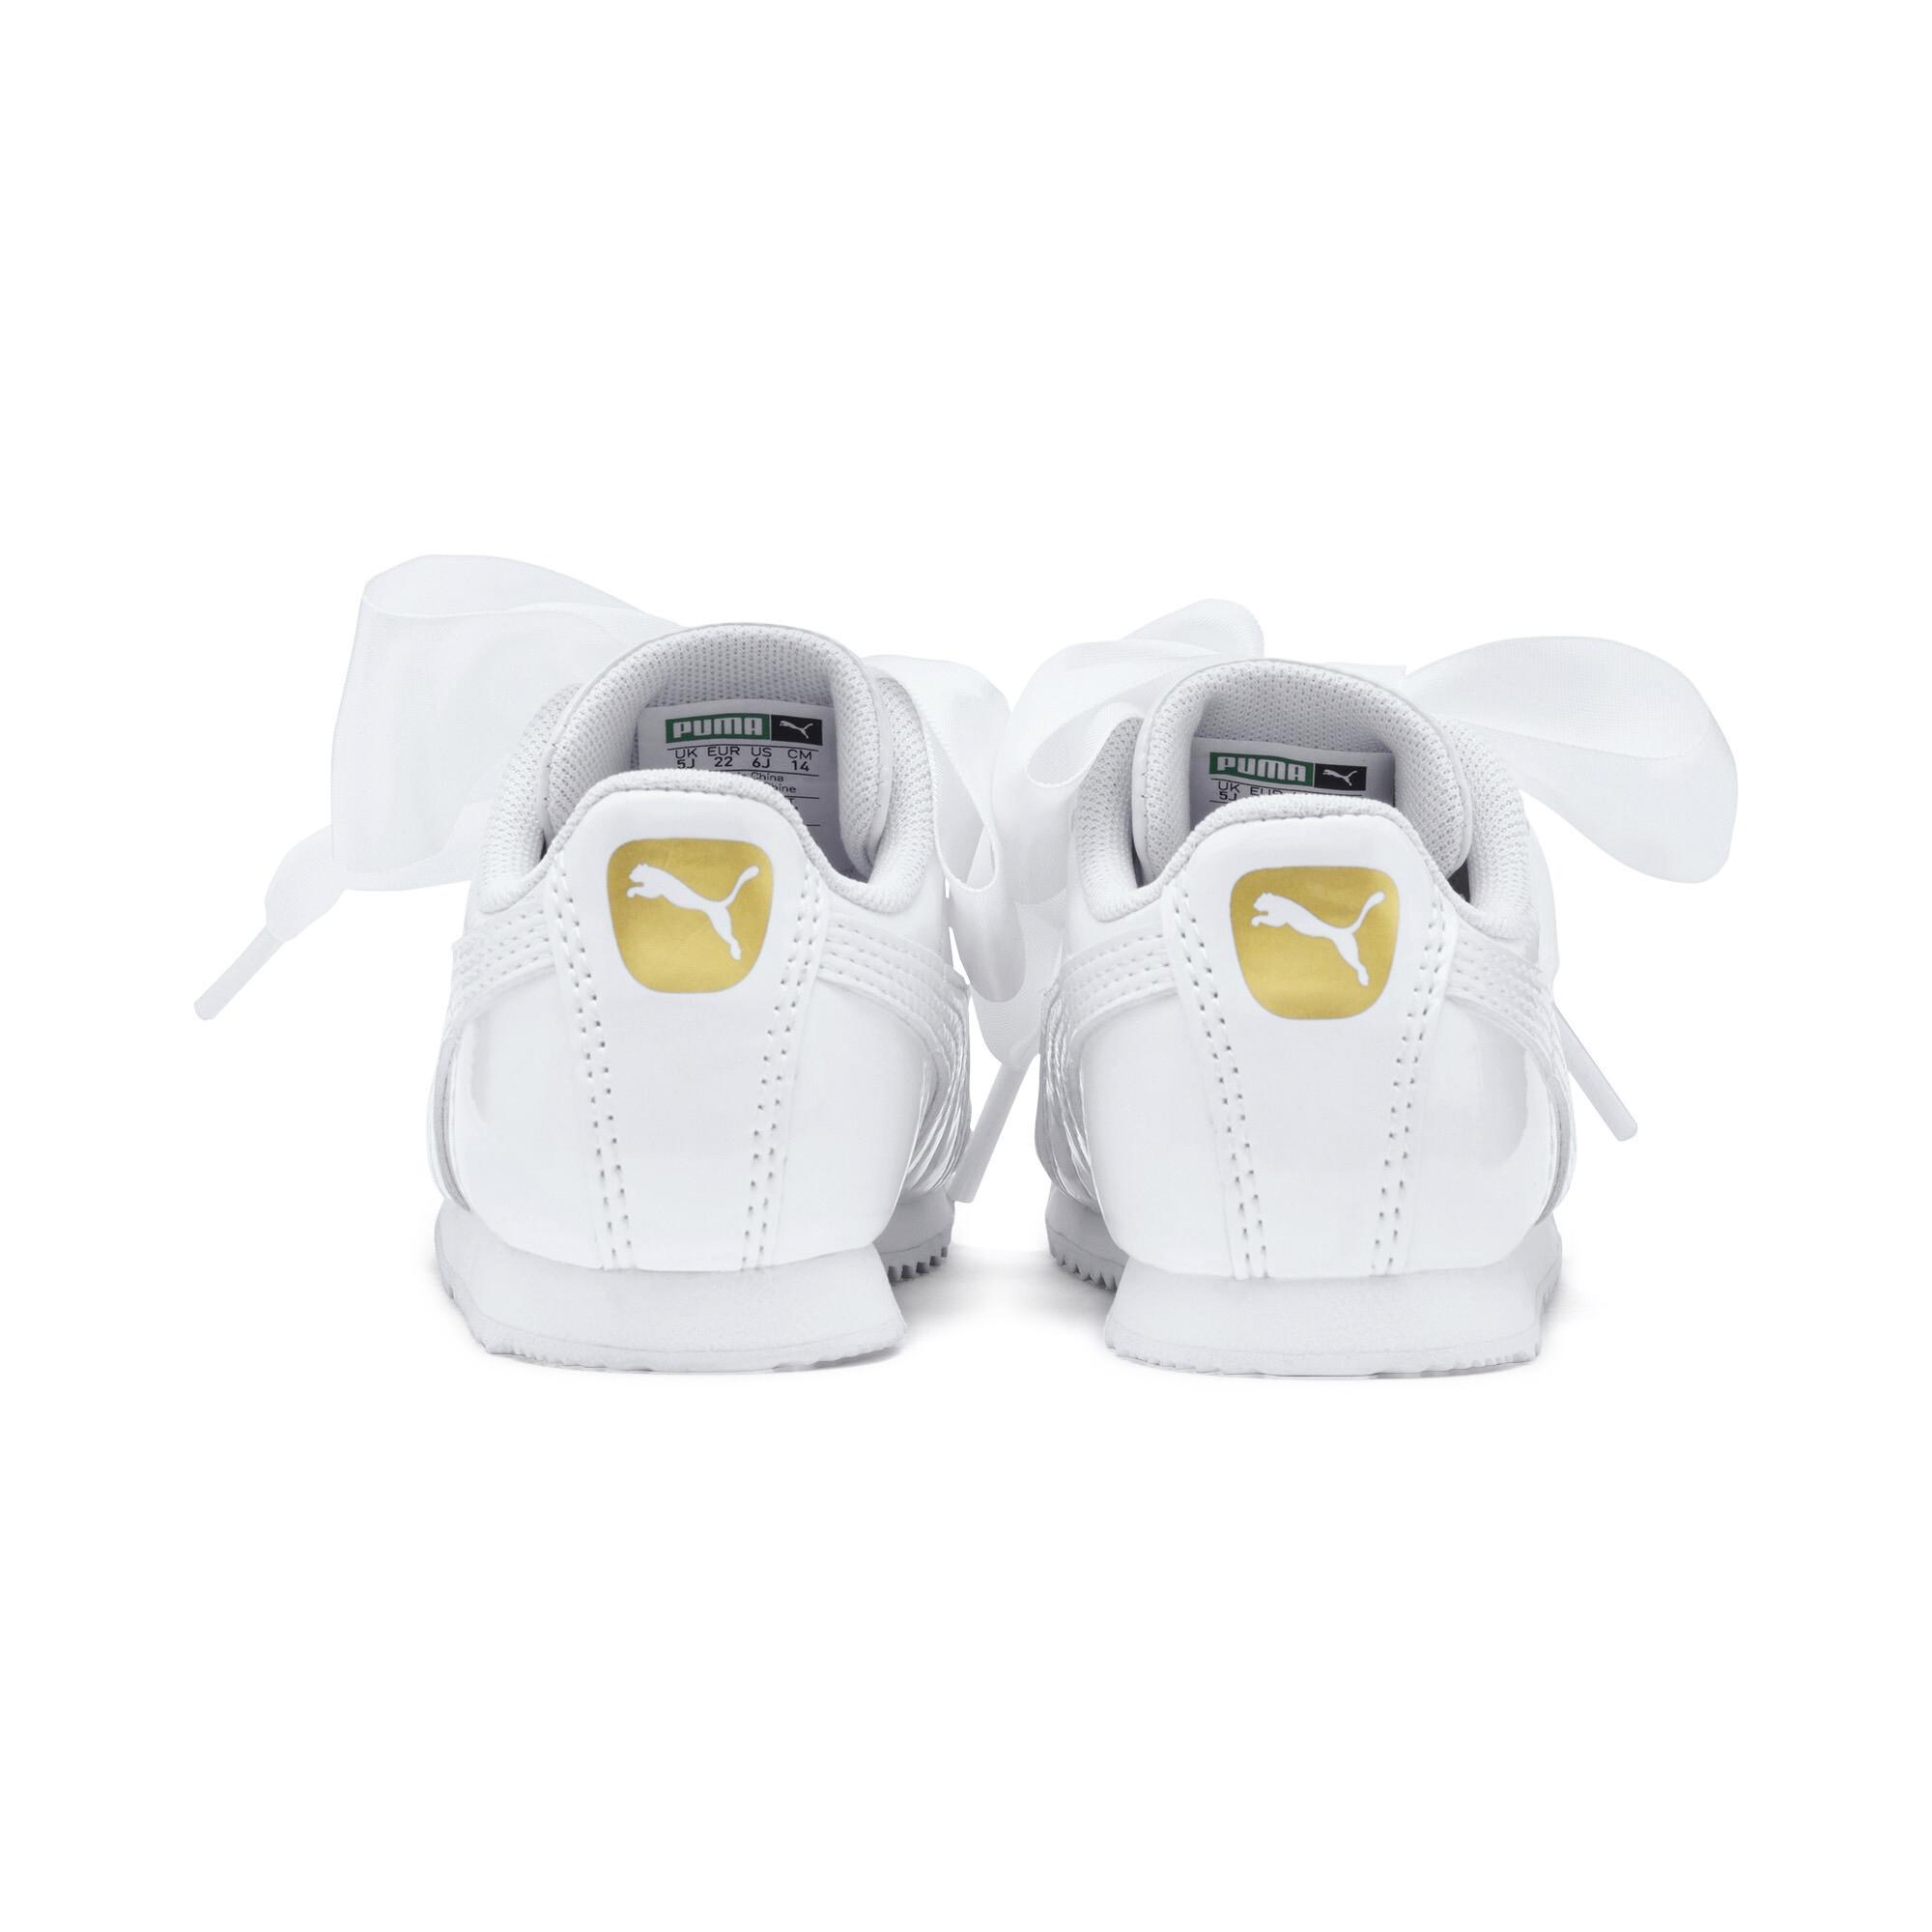 PUMA-Roma-Heart-Patent-Toddler-Shoes-Girls-Shoe-Kids thumbnail 9